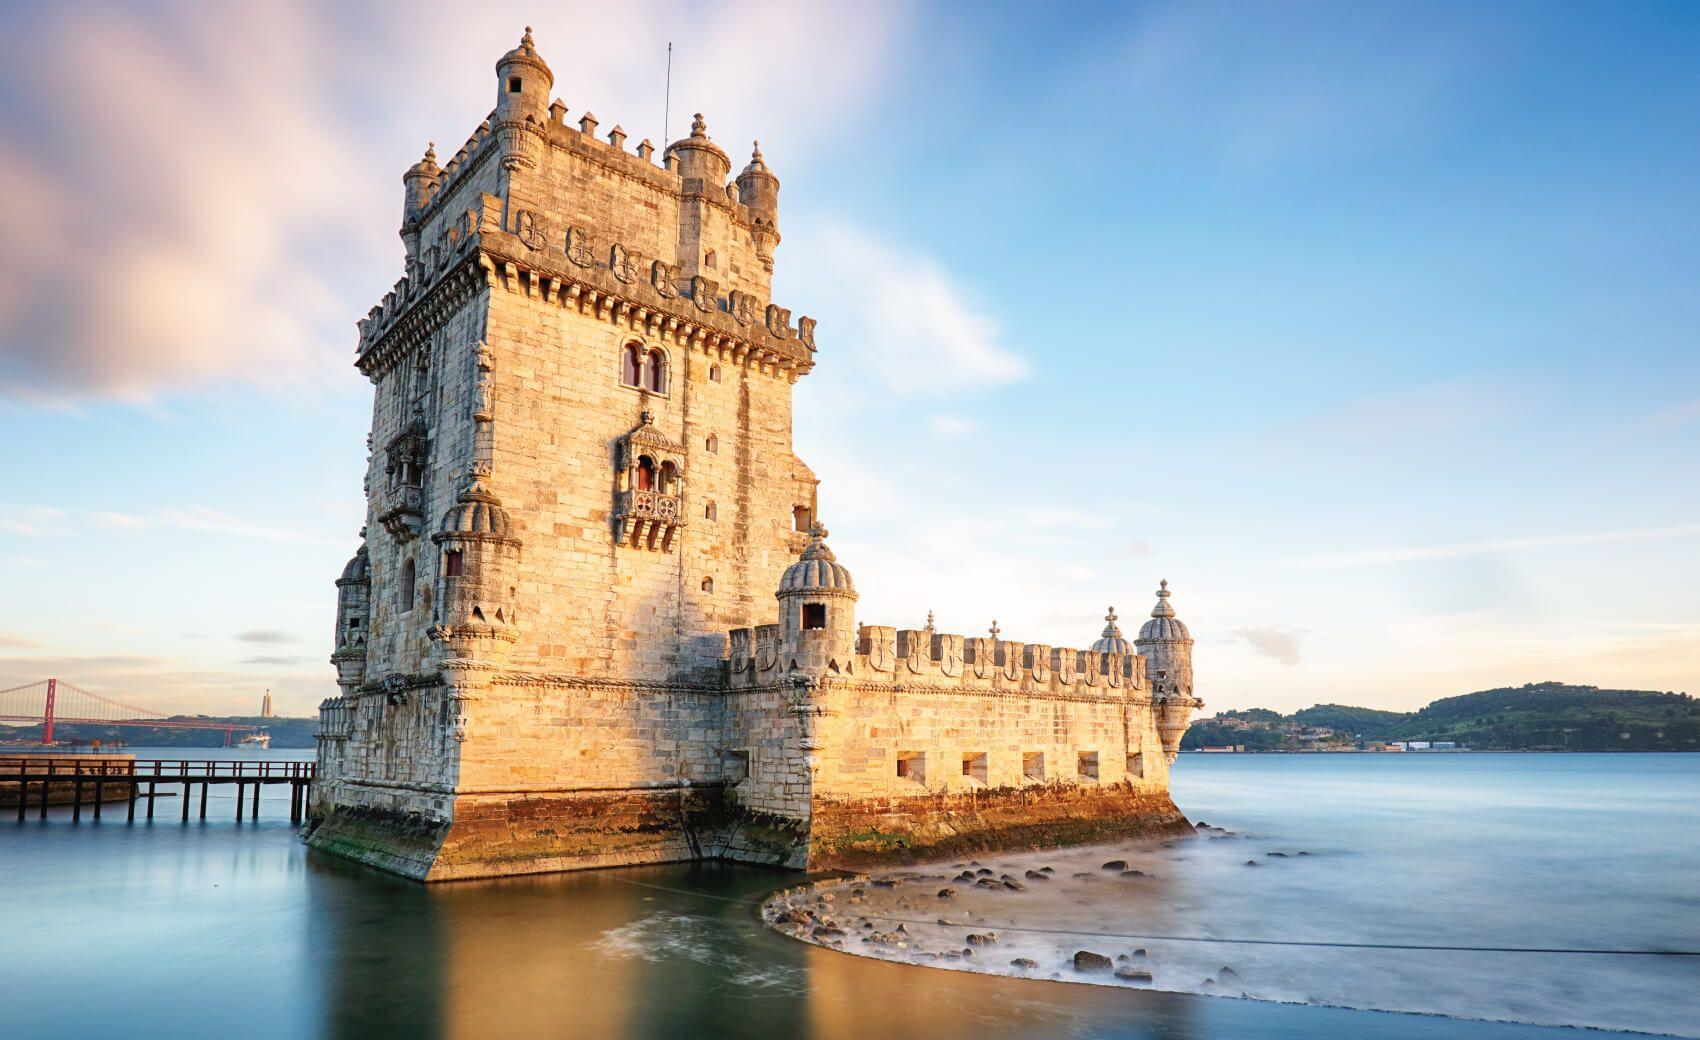 Lisbon, Belem Tower - Tagus River, Portugal